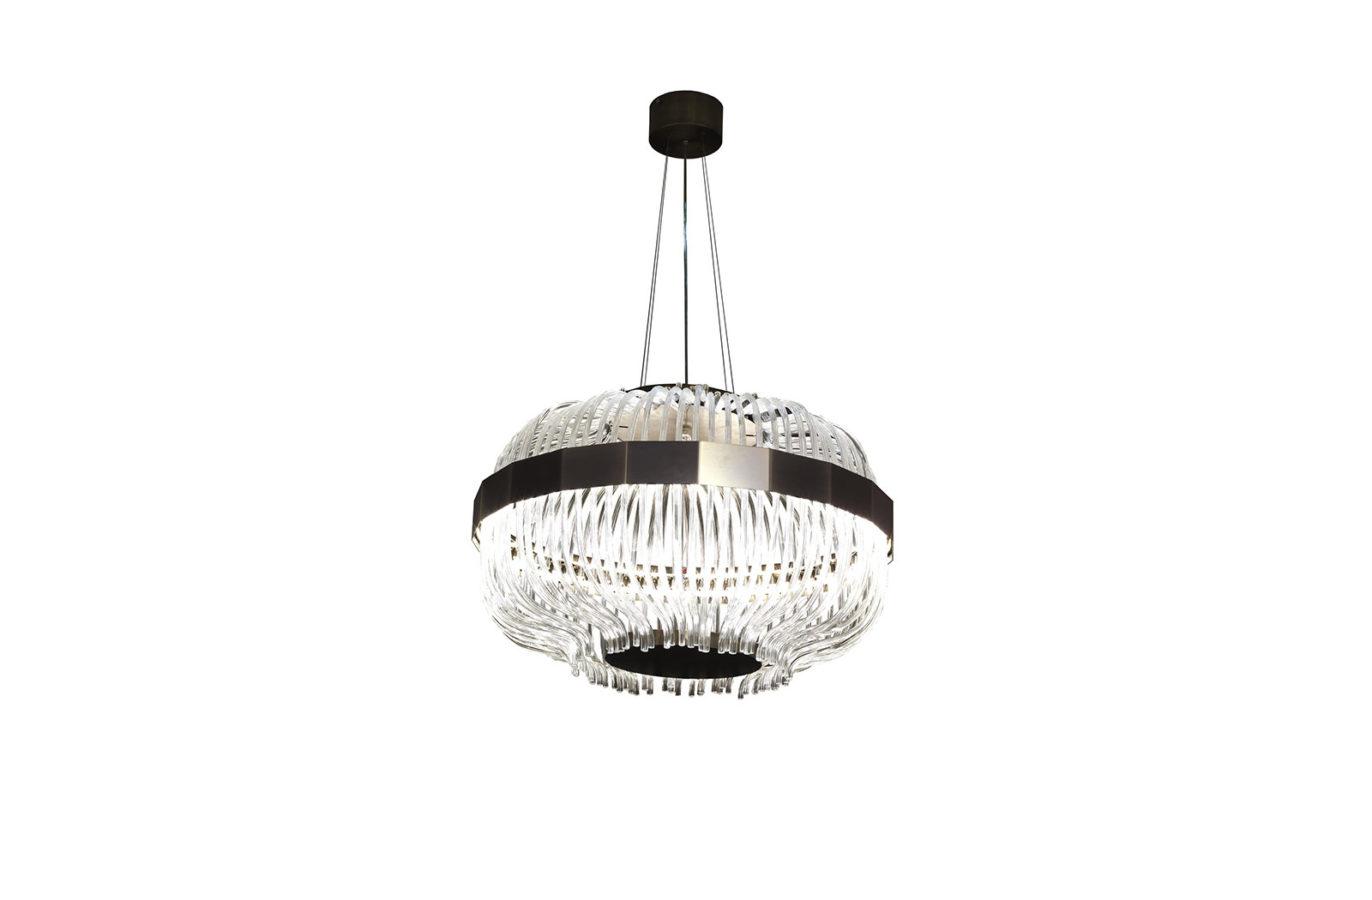 Wicker Suspension Lamp 1